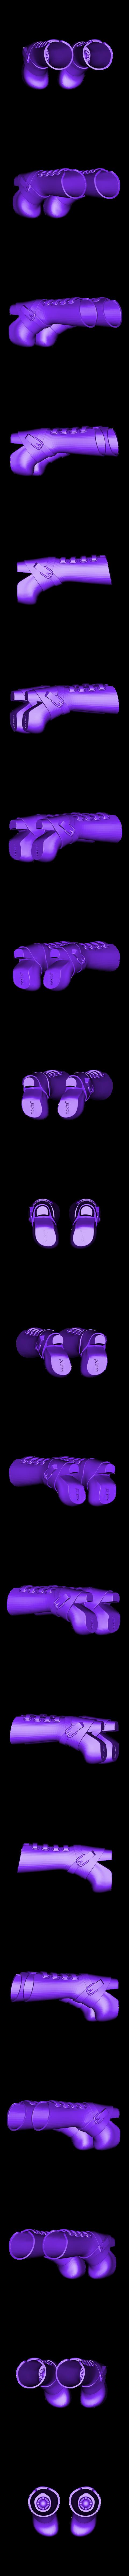 MAKIES_Heeled_glam_boots.STL Download free STL file Makies Glam Boots • 3D print template, Makies